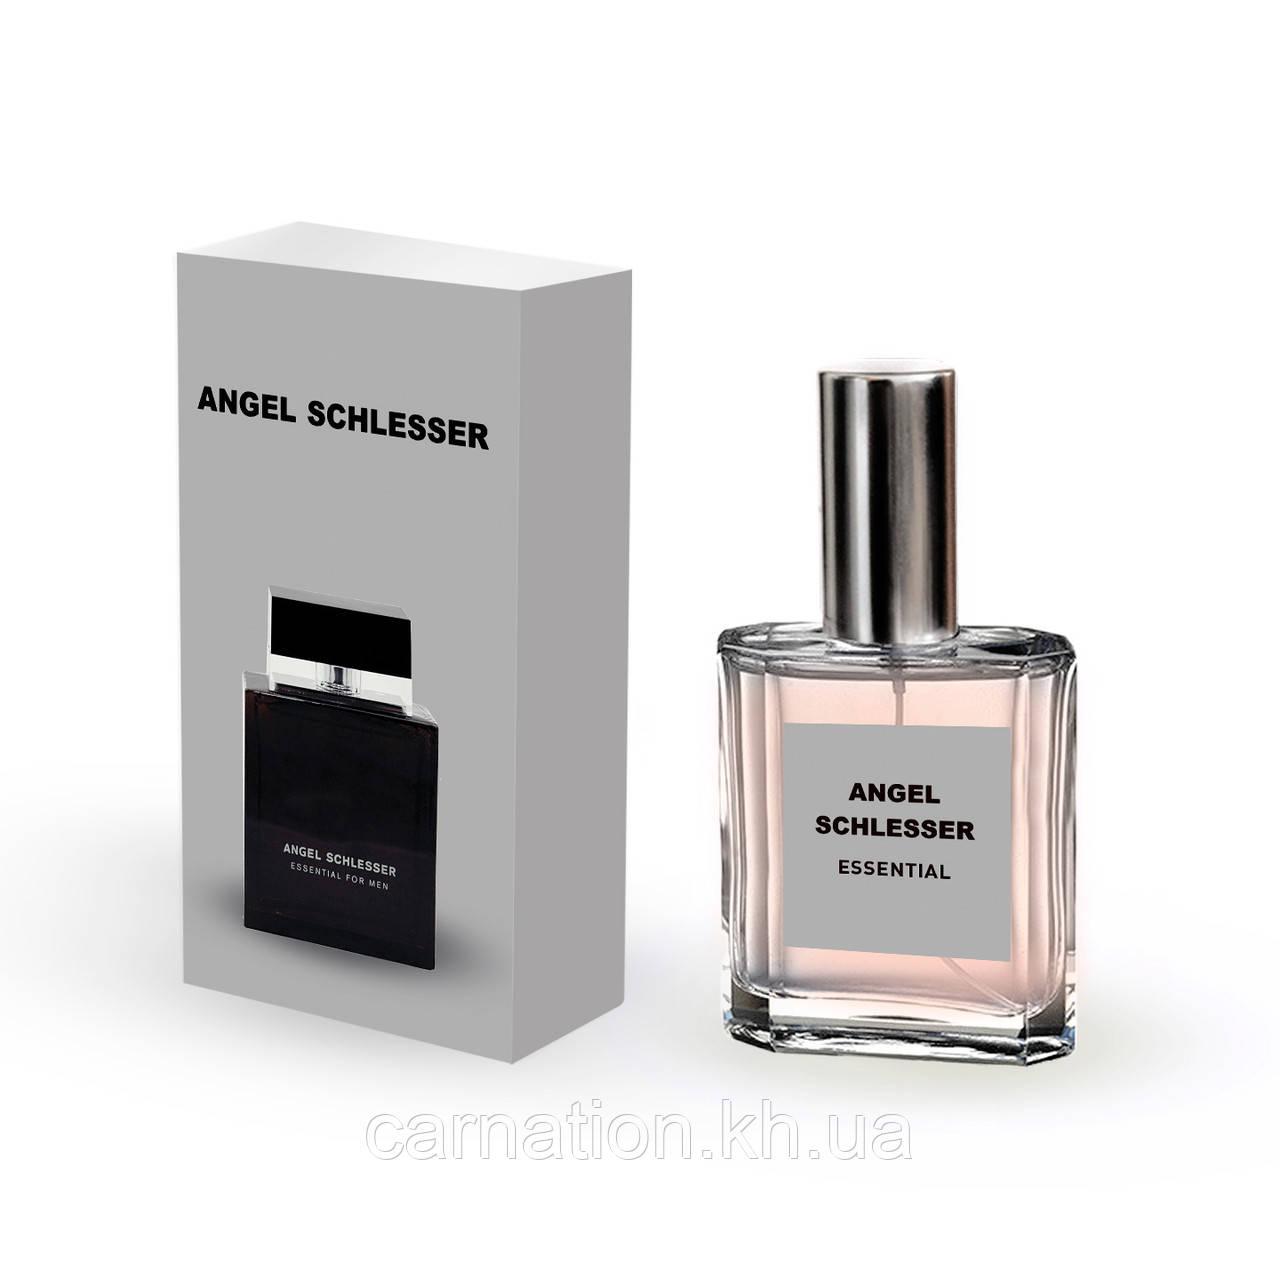 Мужской мини парфюм Angel Schlesser Essential For Men 35 мл